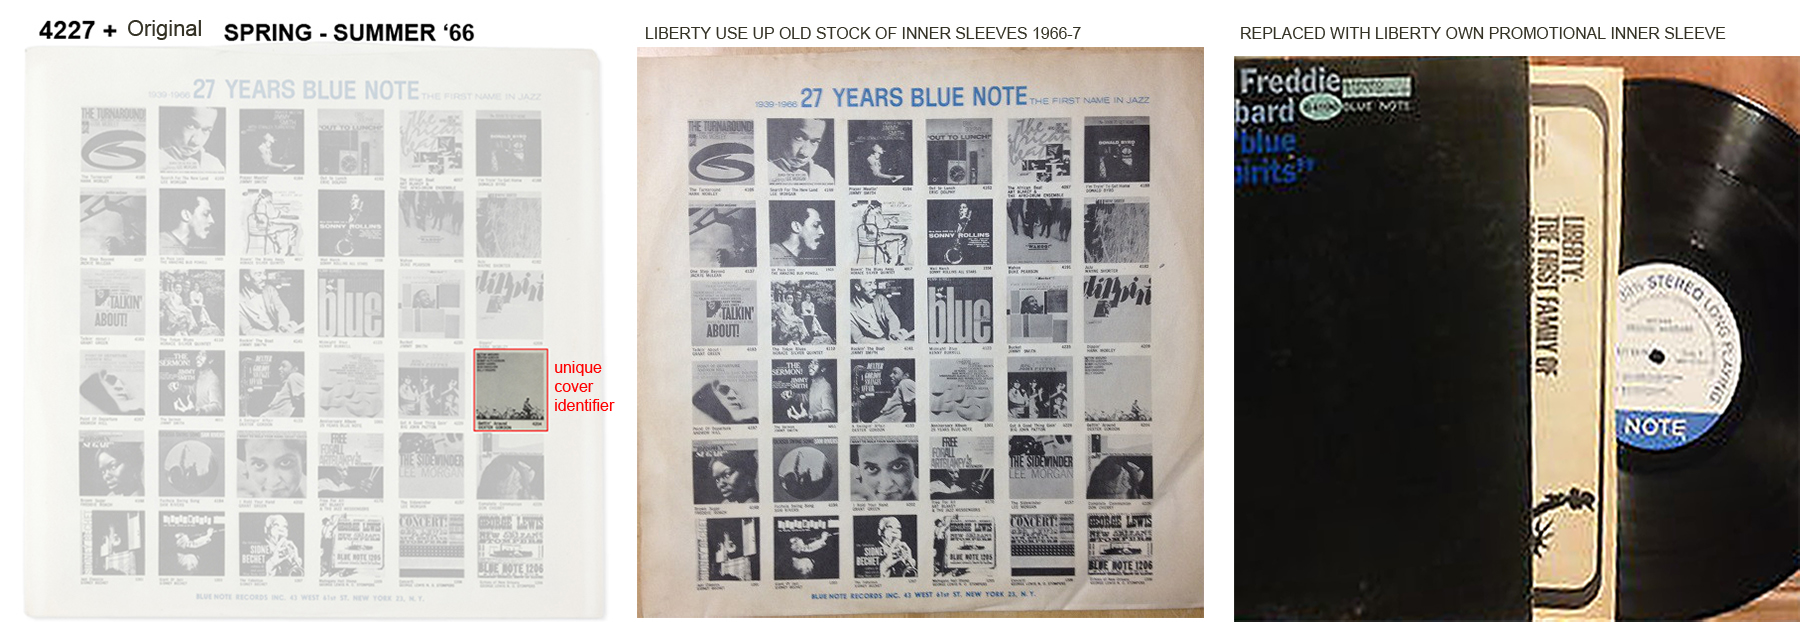 Freddie Hubbard: Blue Spirits (1965) Blue Note/Liberty ...